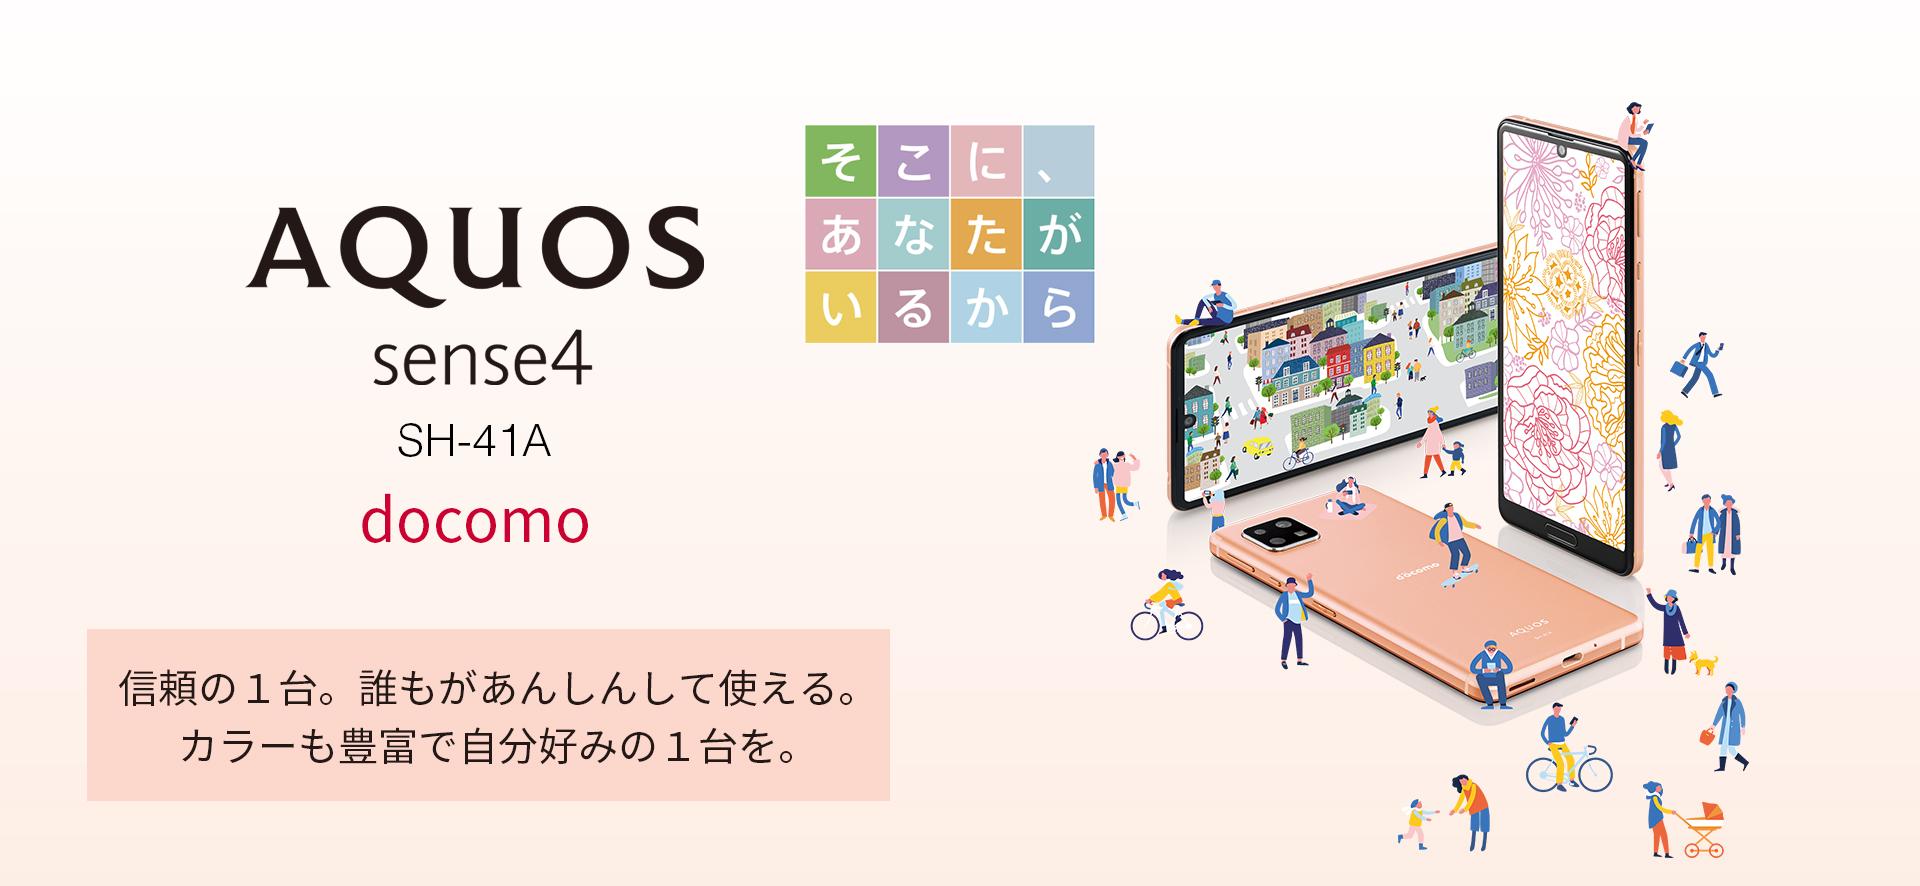 AQUOS sense4 ドコモ版